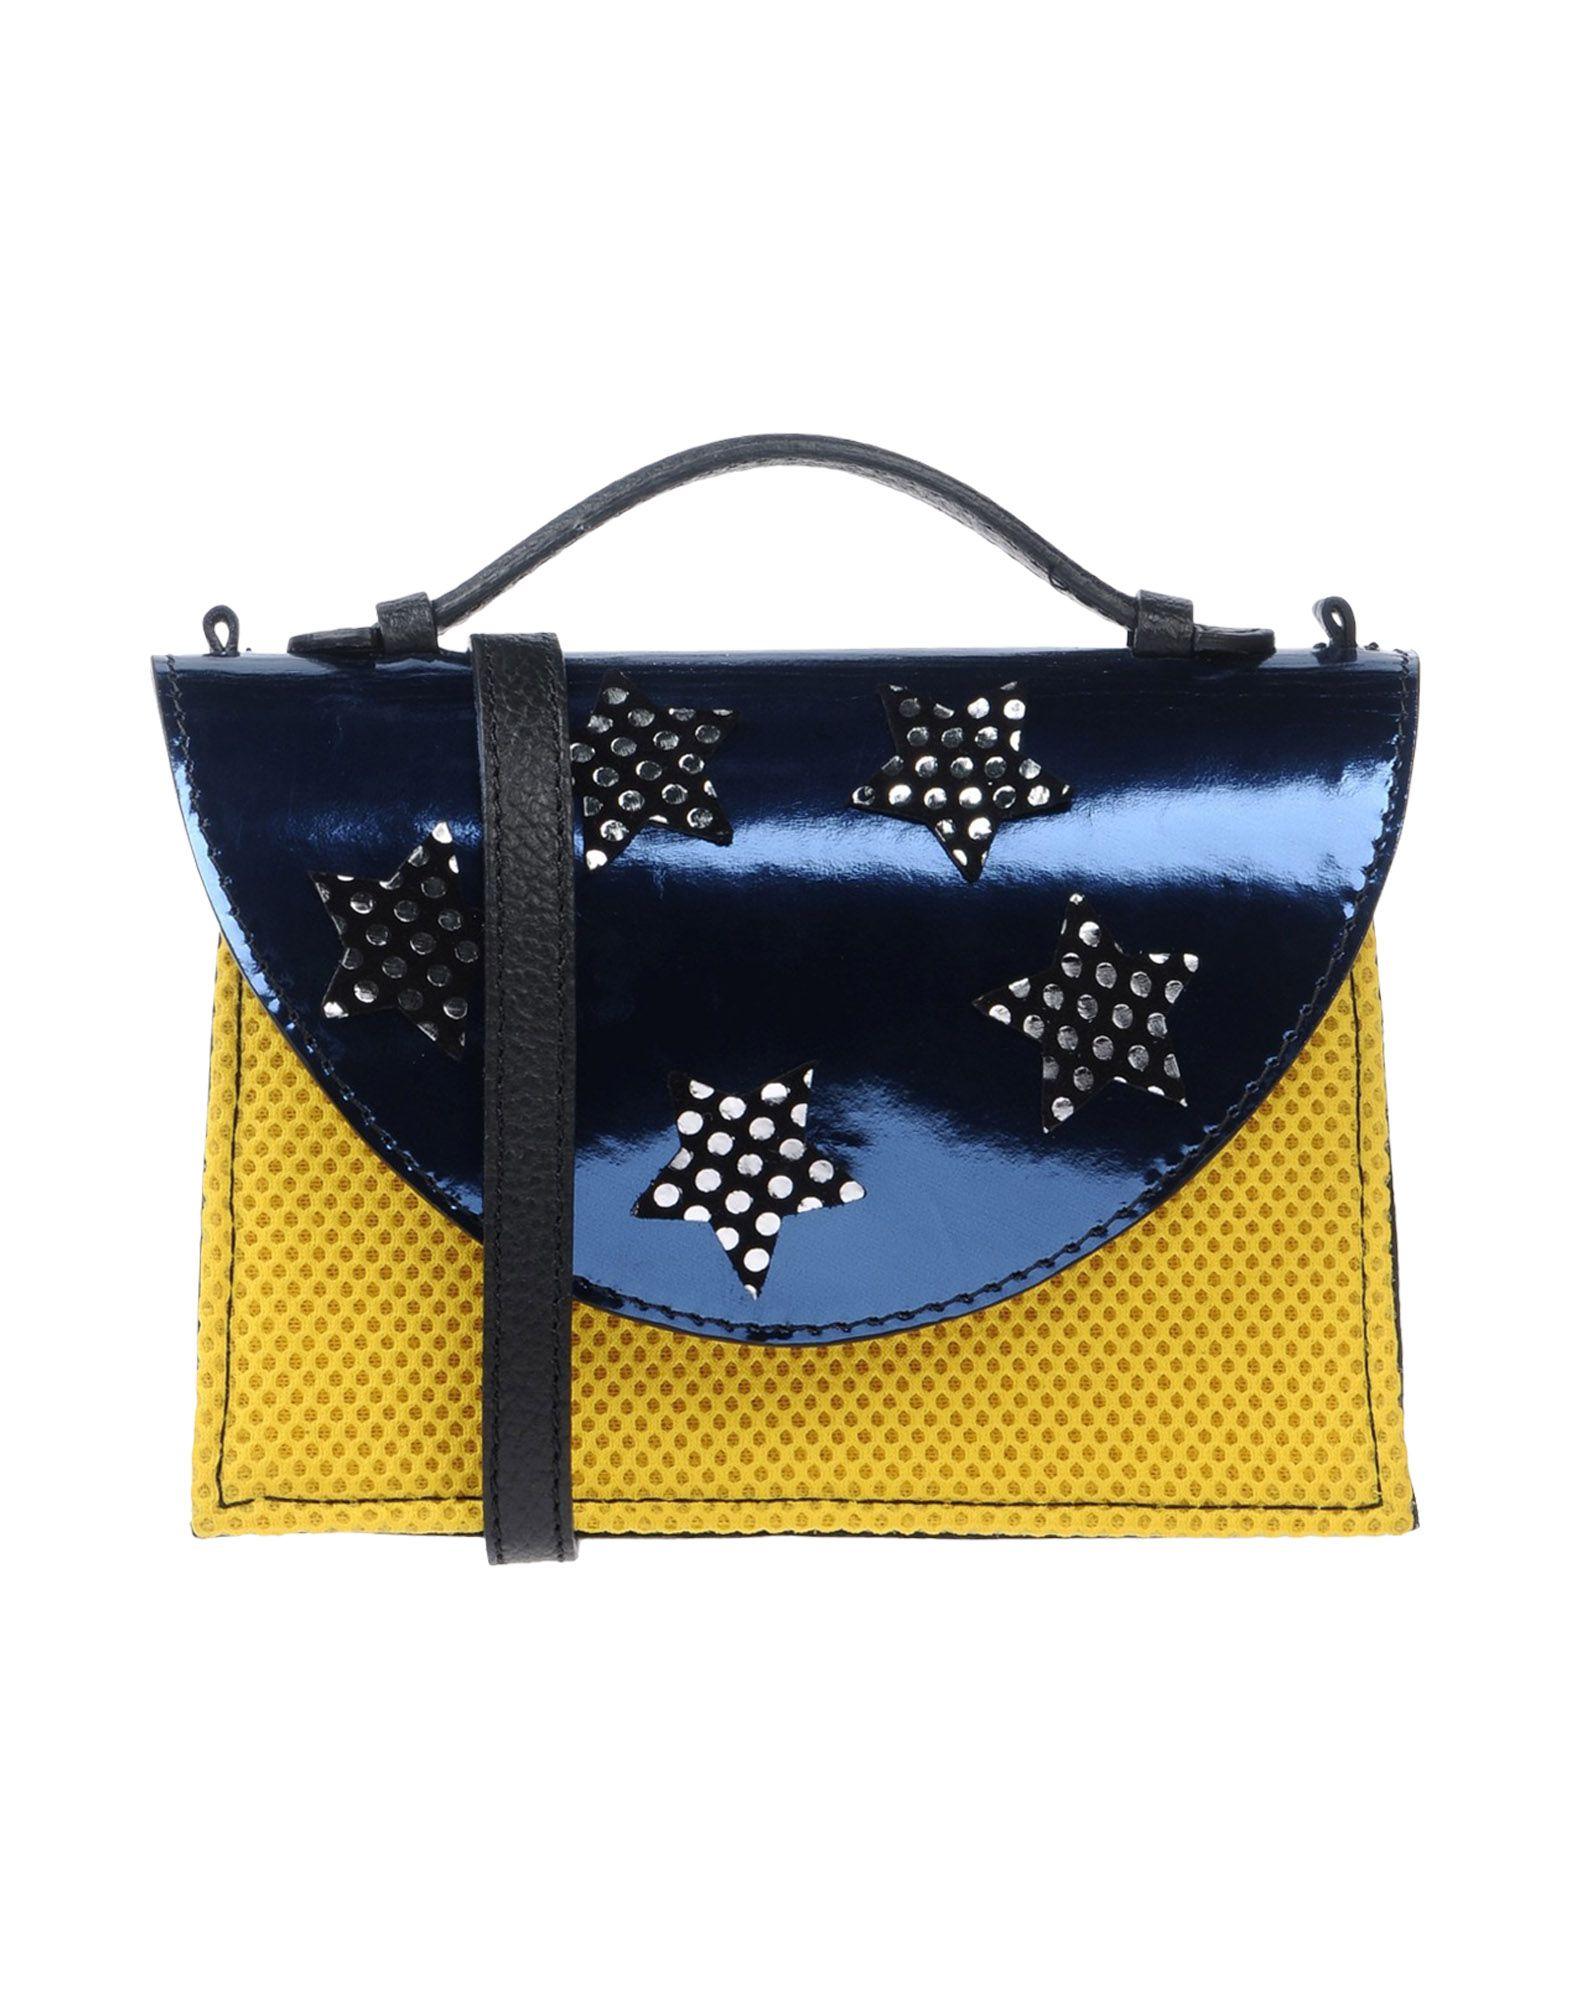 IMEMOI Handbag in Dark Blue